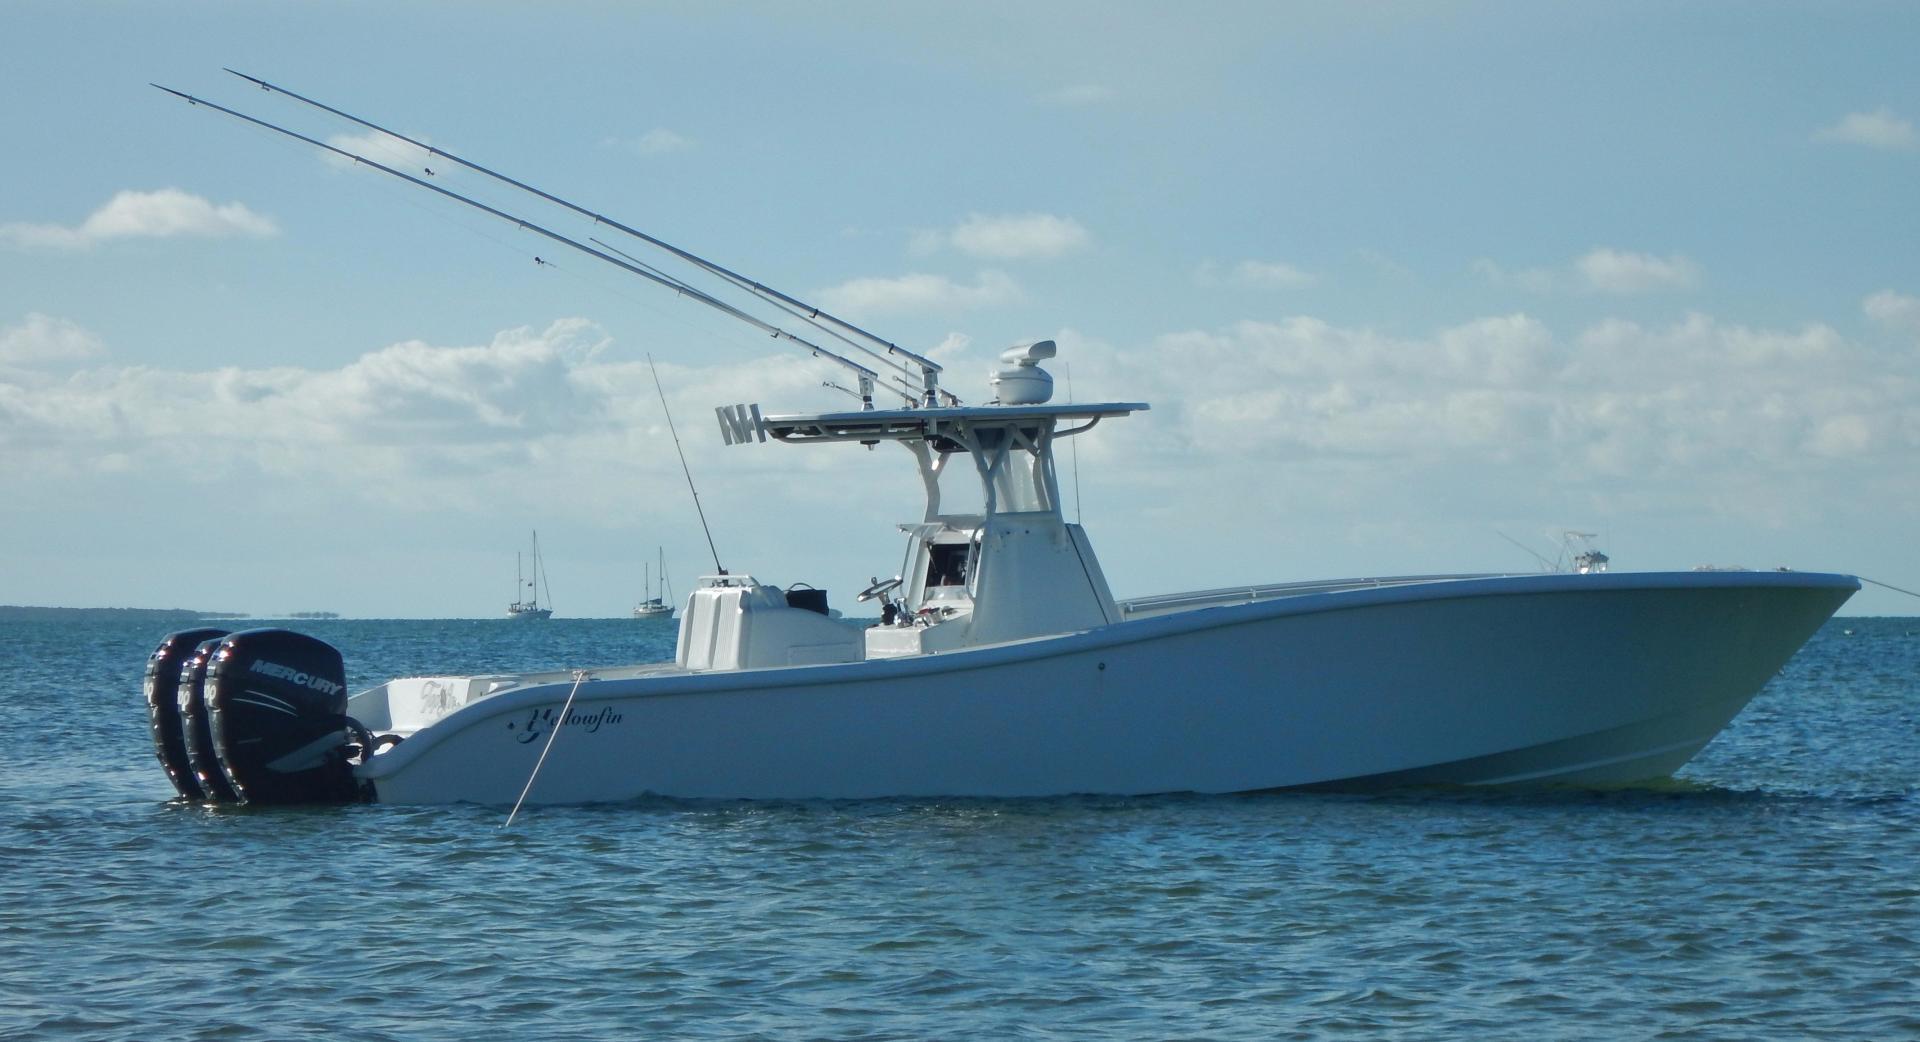 Yellowfin